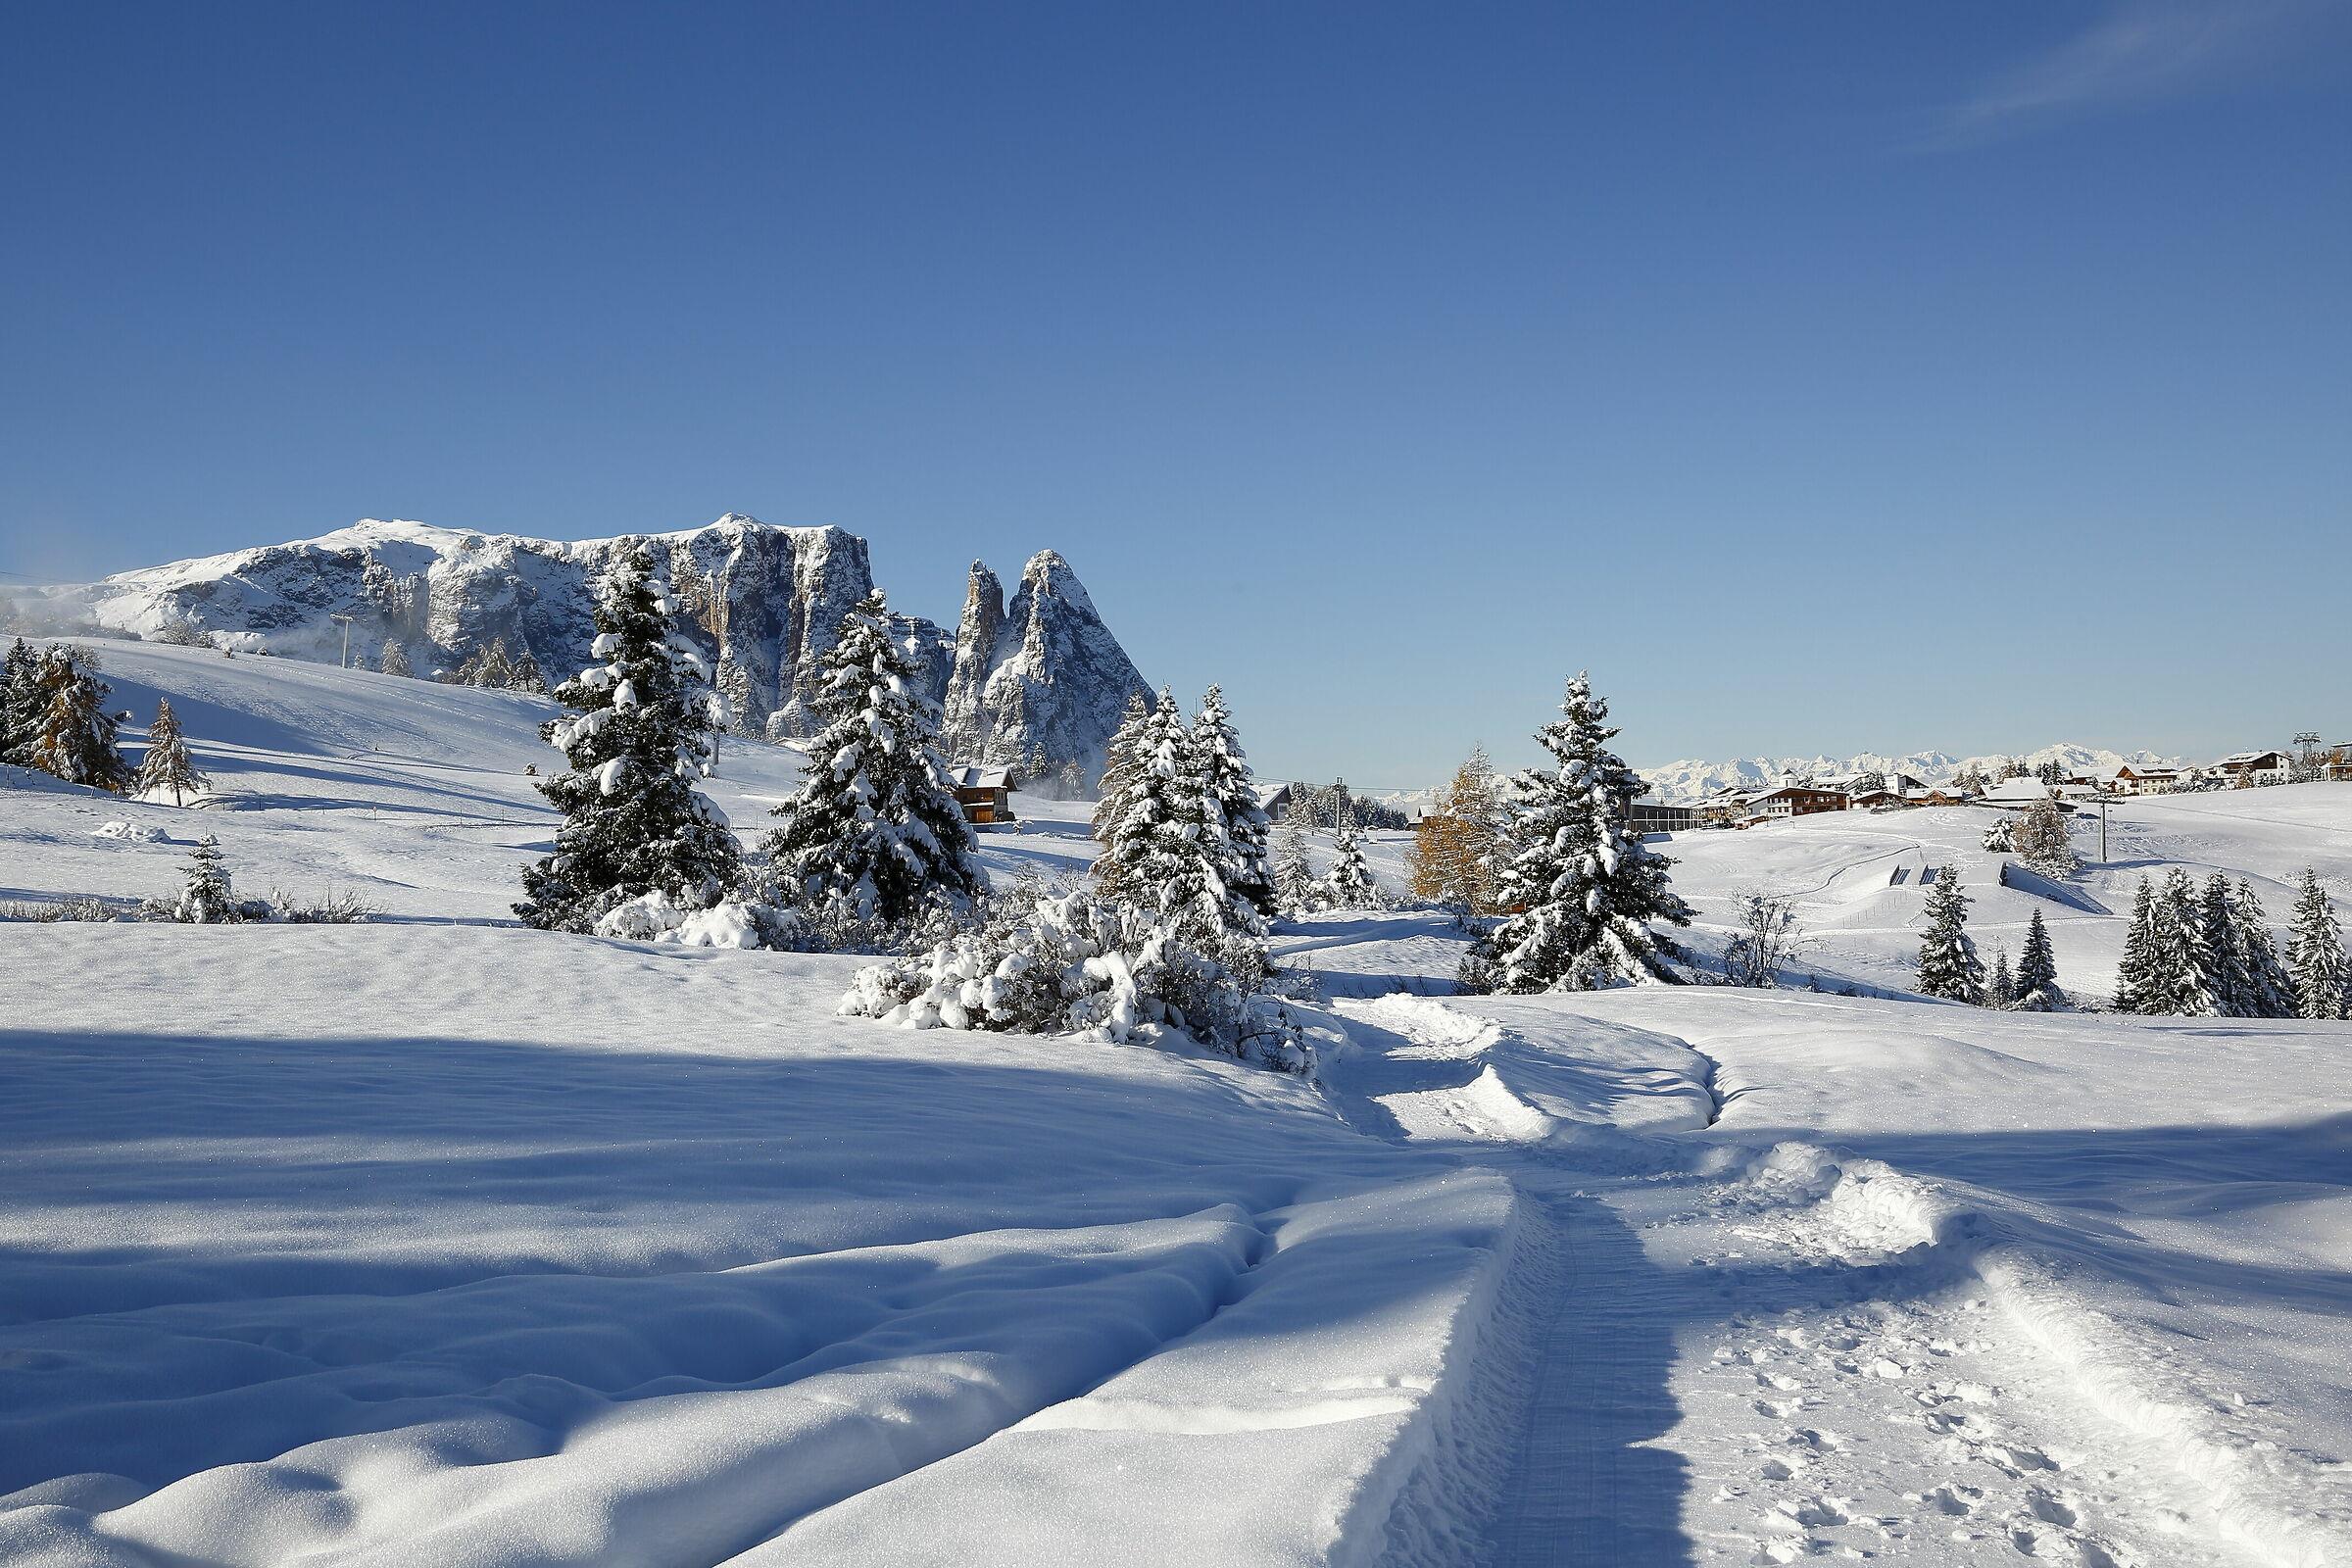 The Sciliar seen from the Alpe di Siusi ...